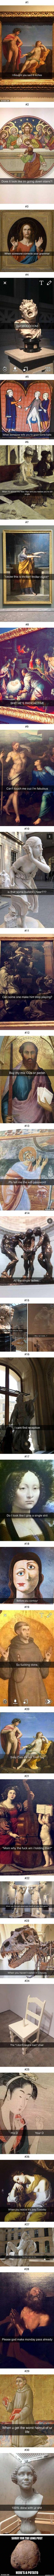 Medieval art memes